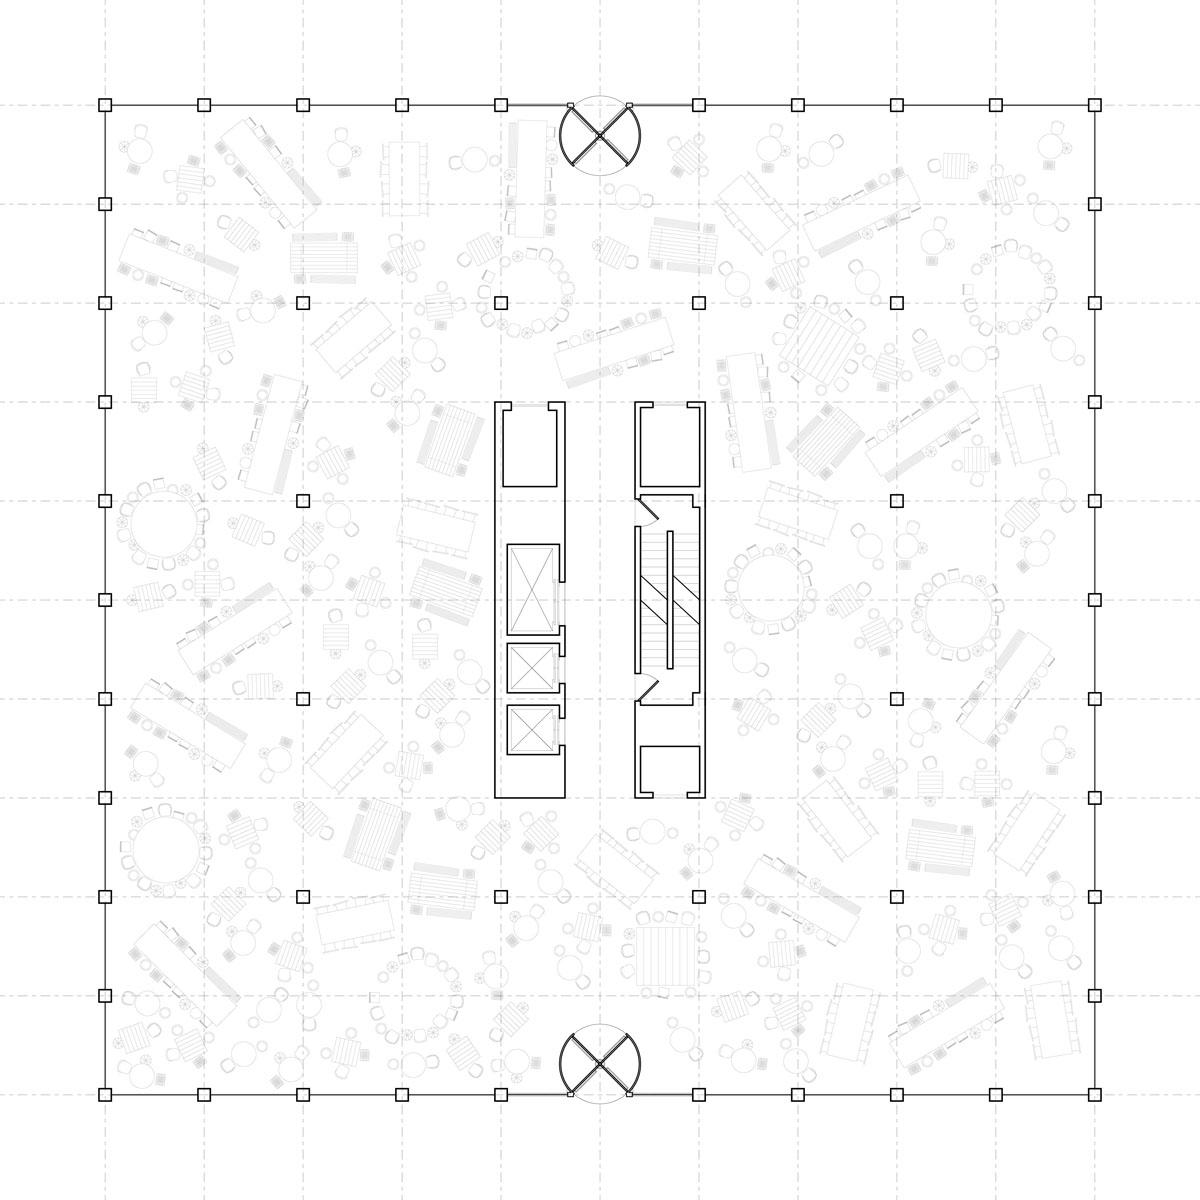 05_PLAN-Tables-01.jpg